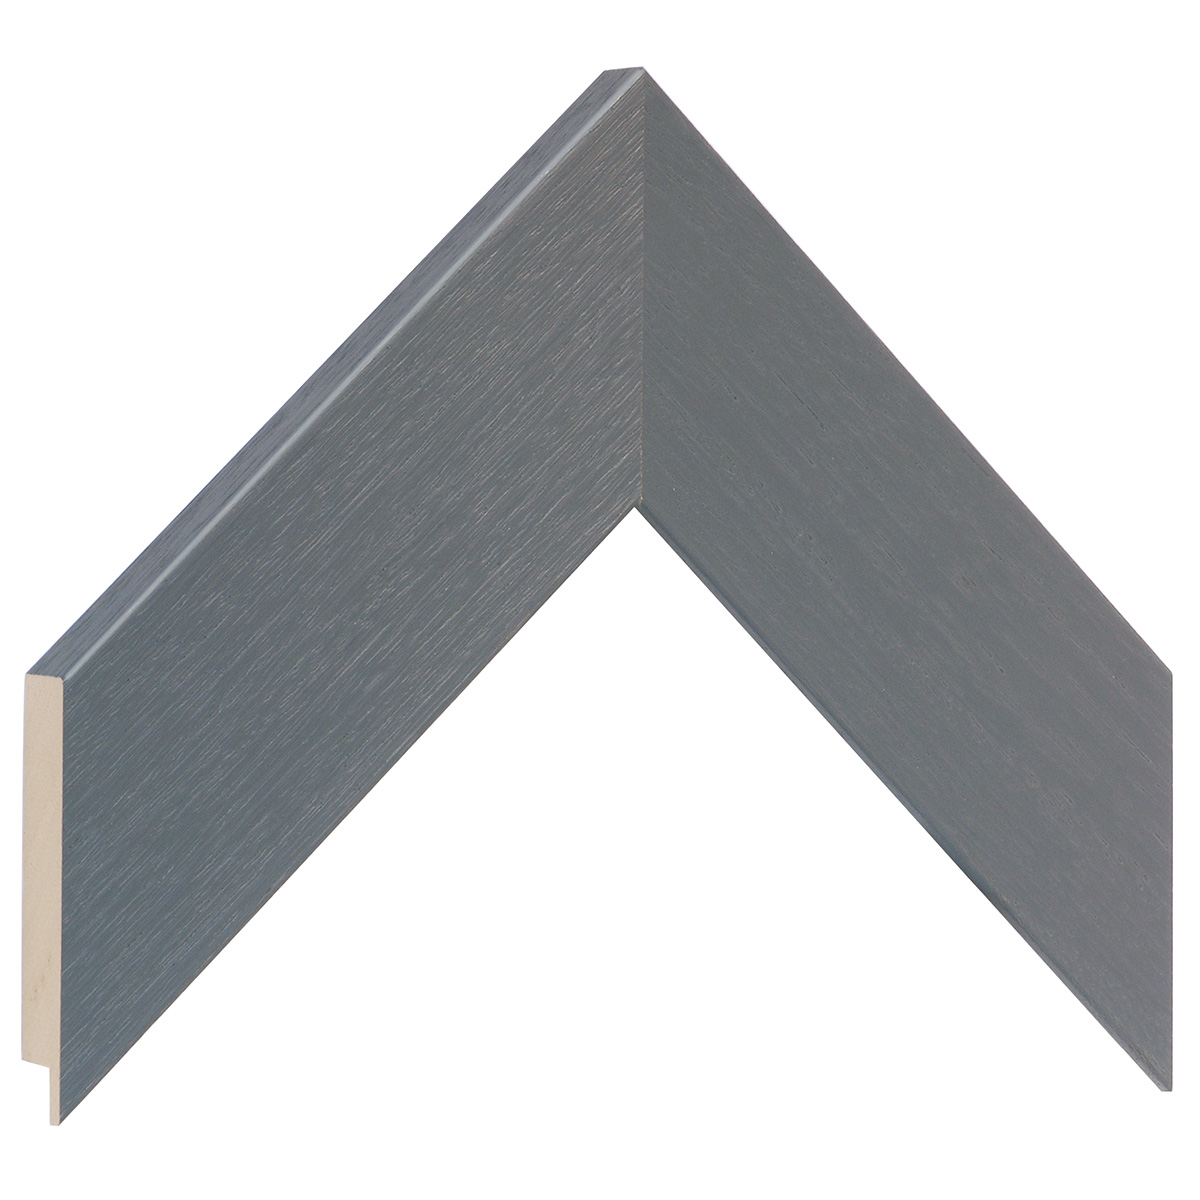 Moulding ayous 53mm - matt finish, grey